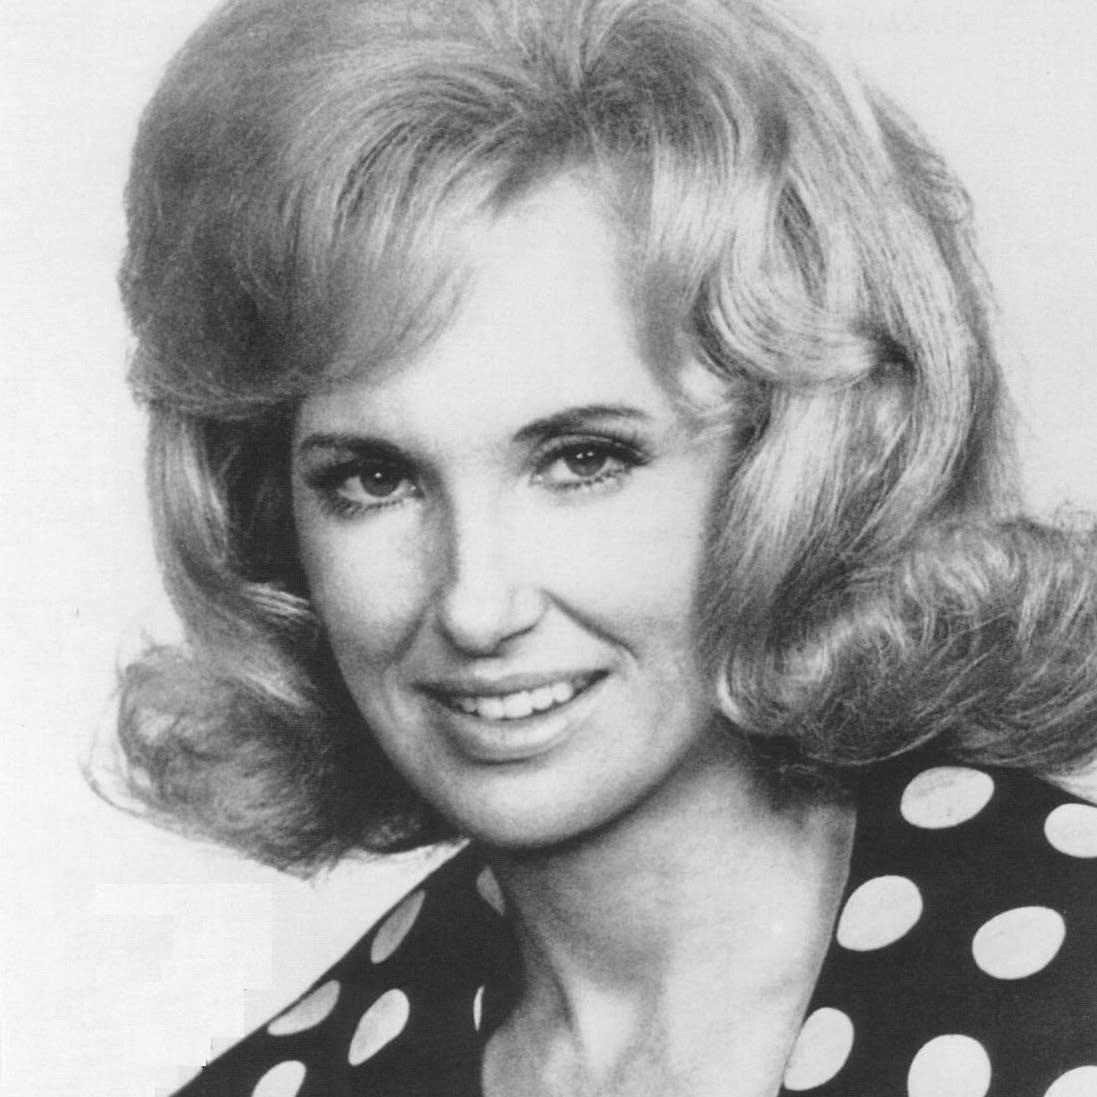 Tammy Wynette 1975 publicity photo